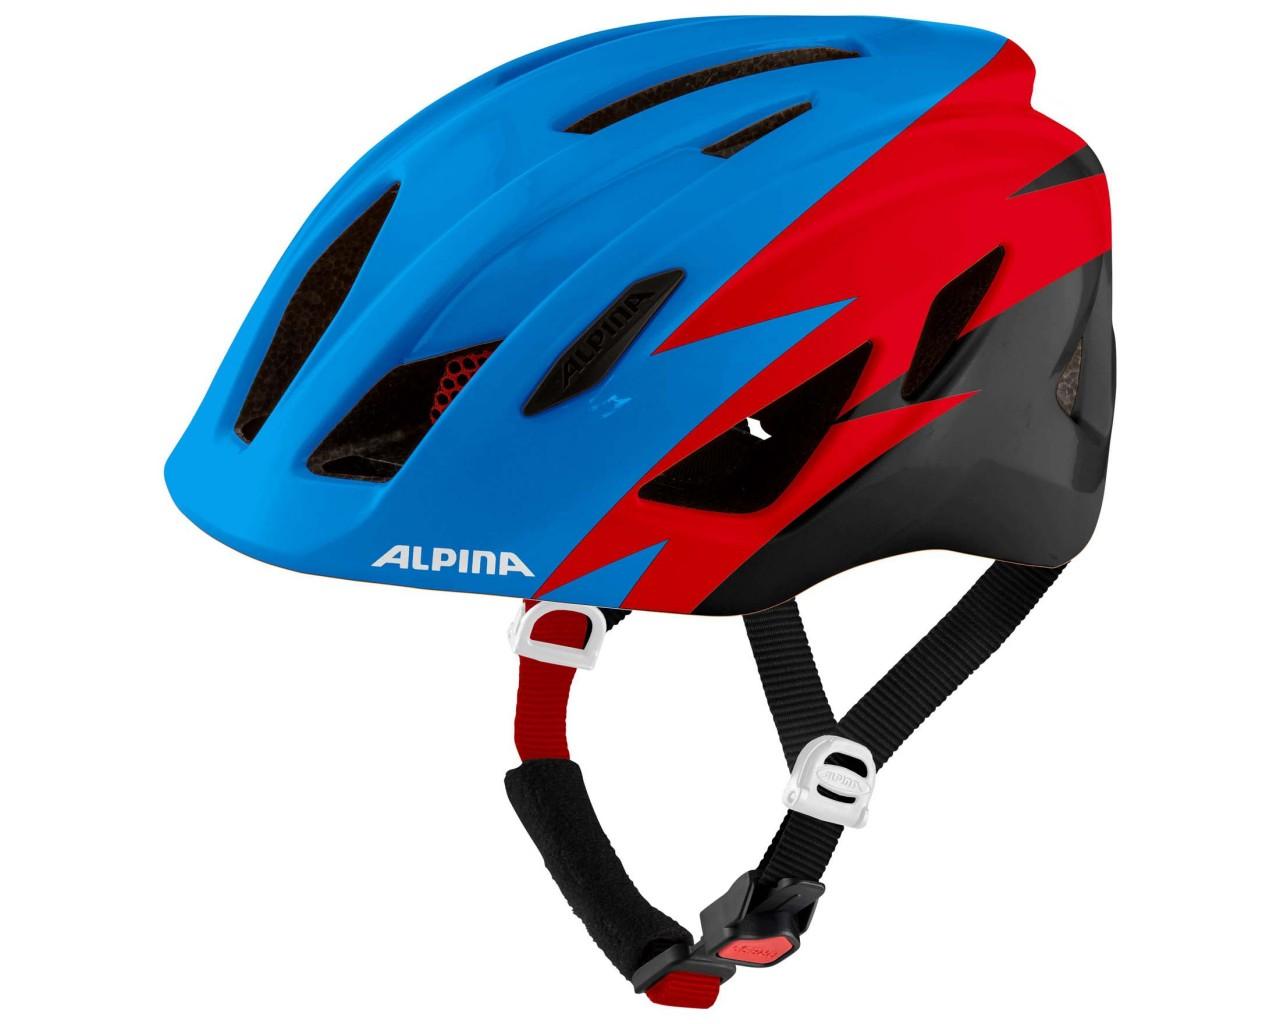 Alpina Pico Kinder Fahrradhelm   blue-red-black gloss 50-55